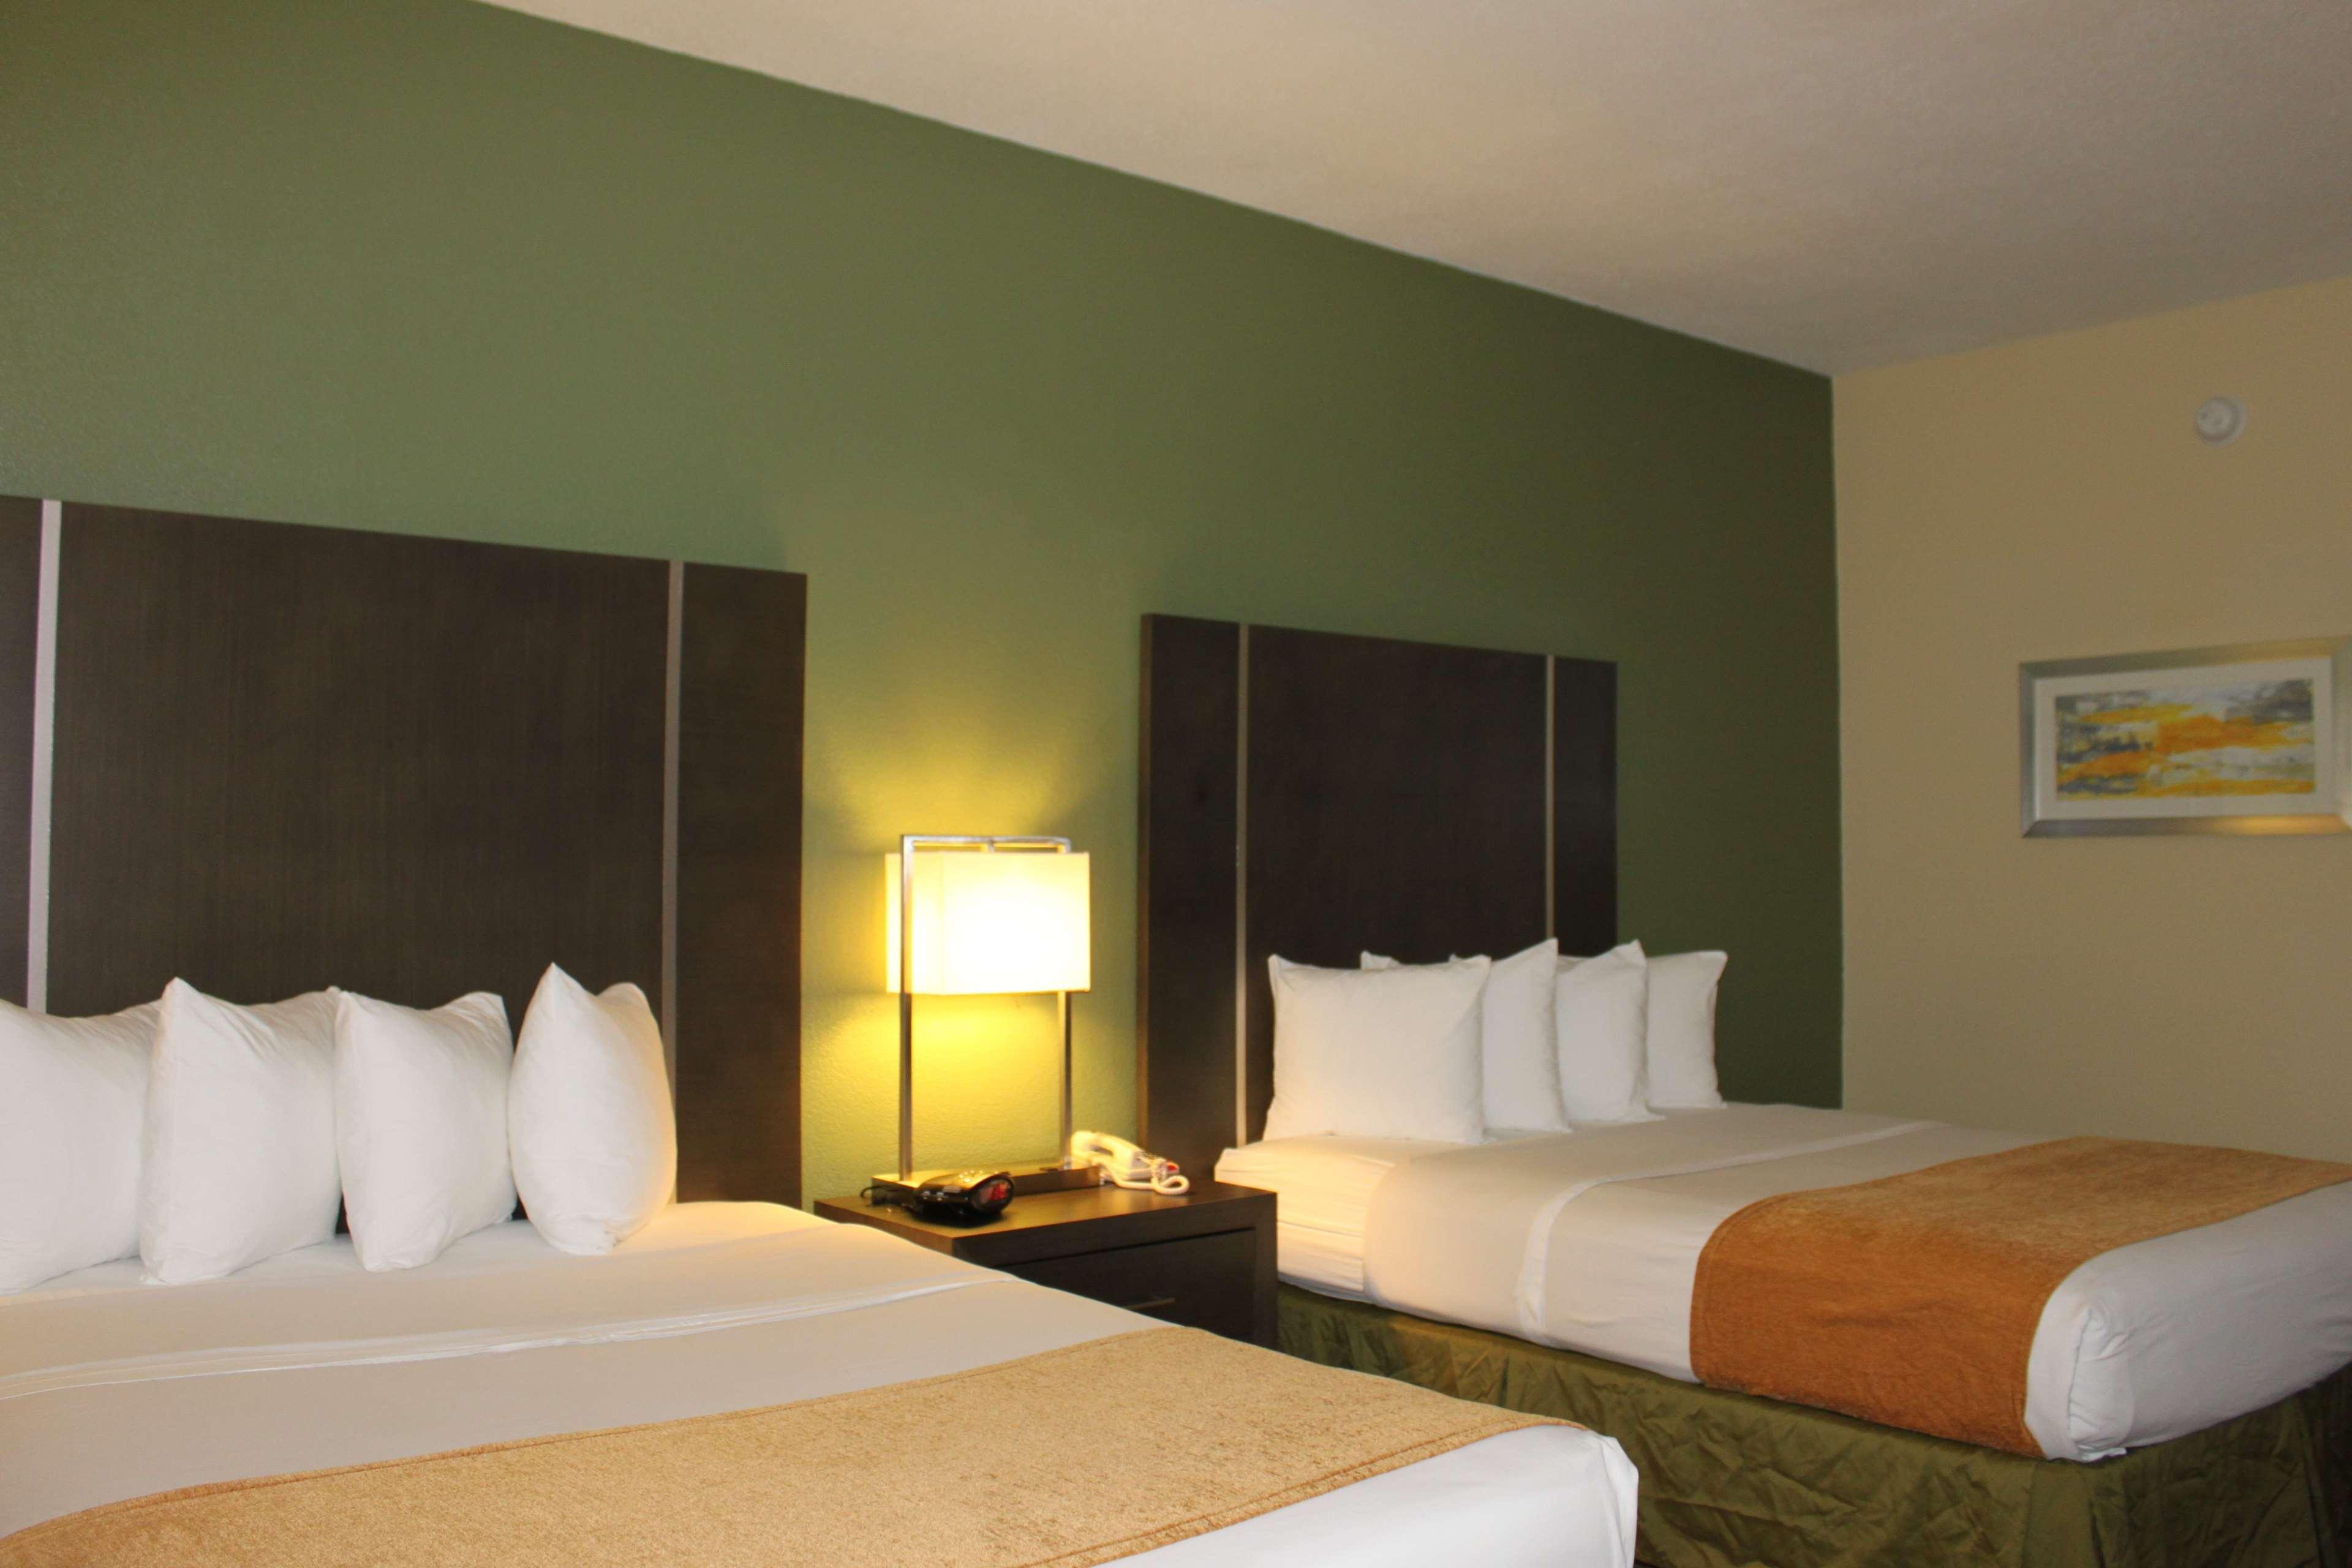 Best Western Plus North Houston Inn & Suites image 24